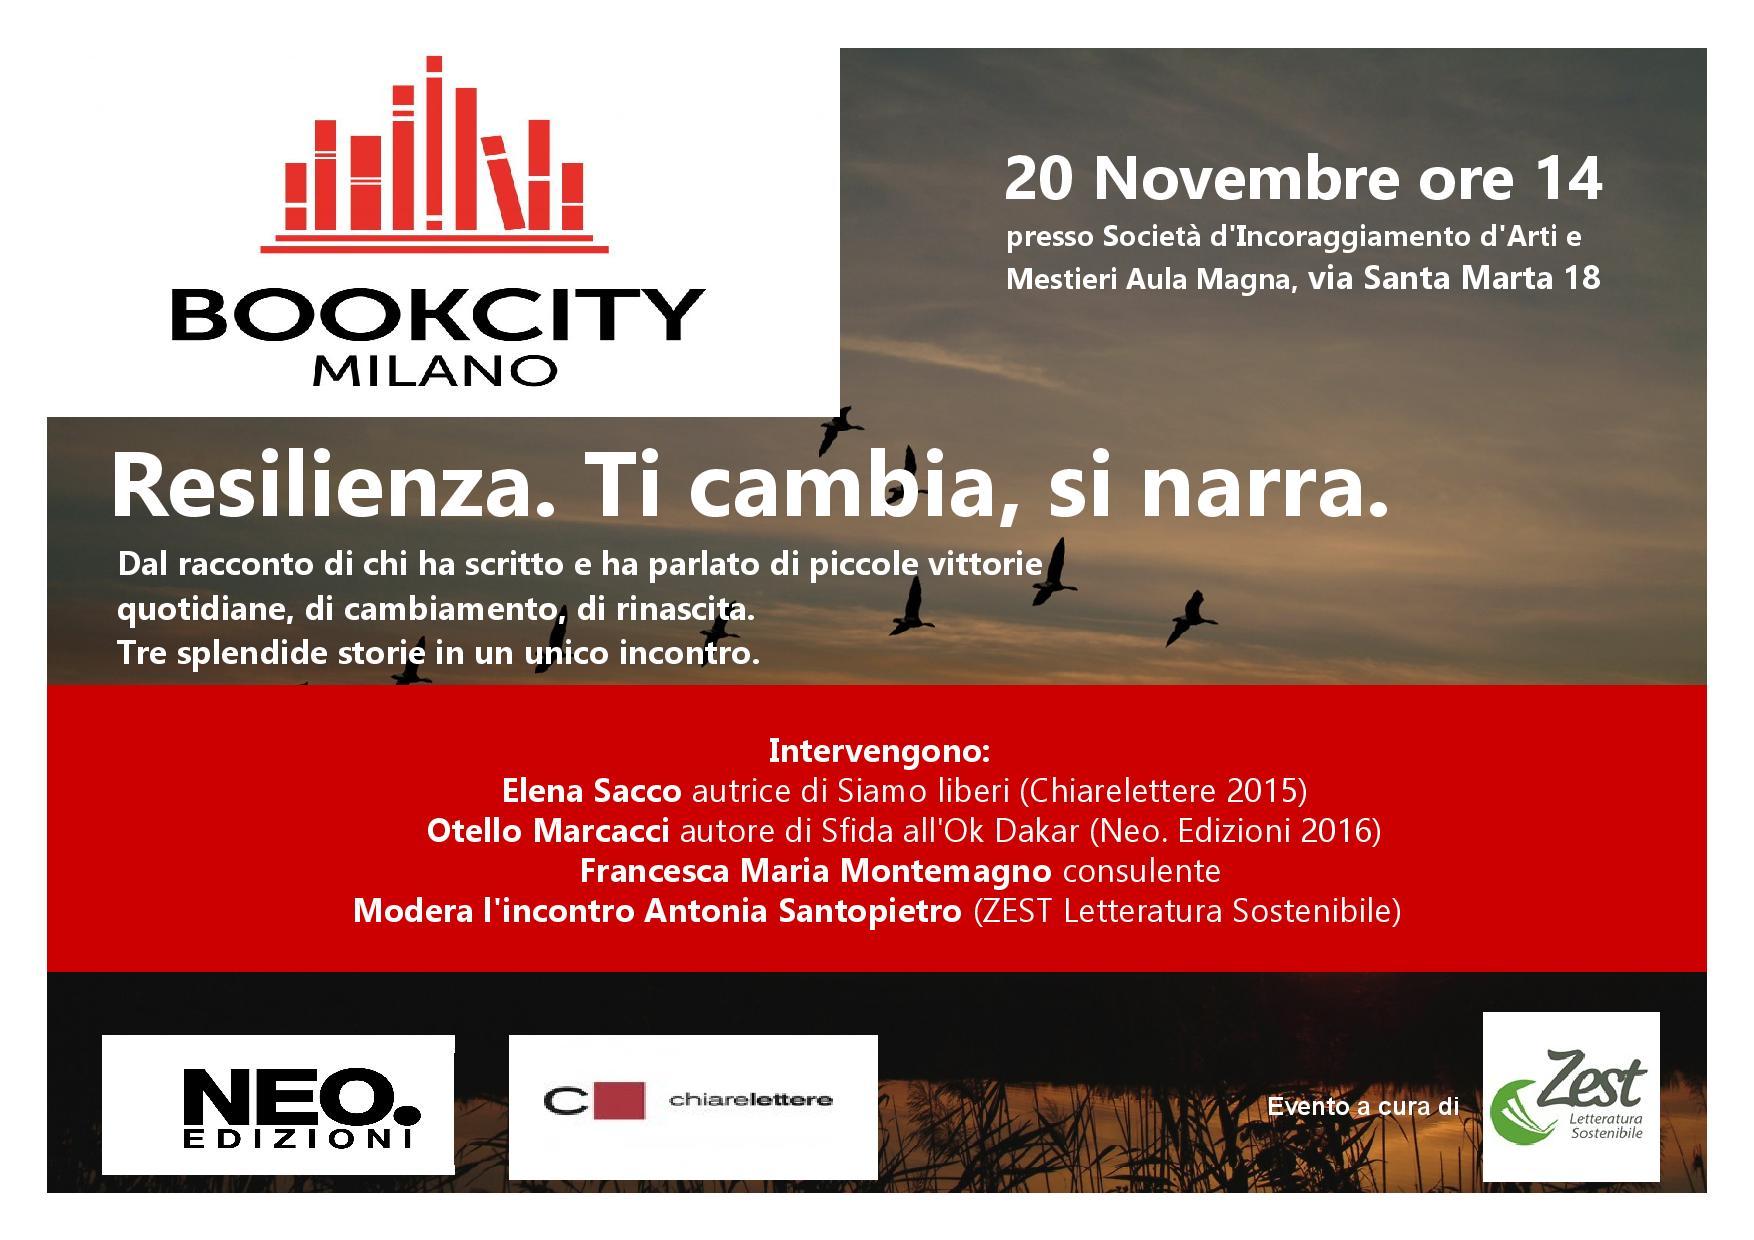 bookcity-20-novembre-resilienza-page-001